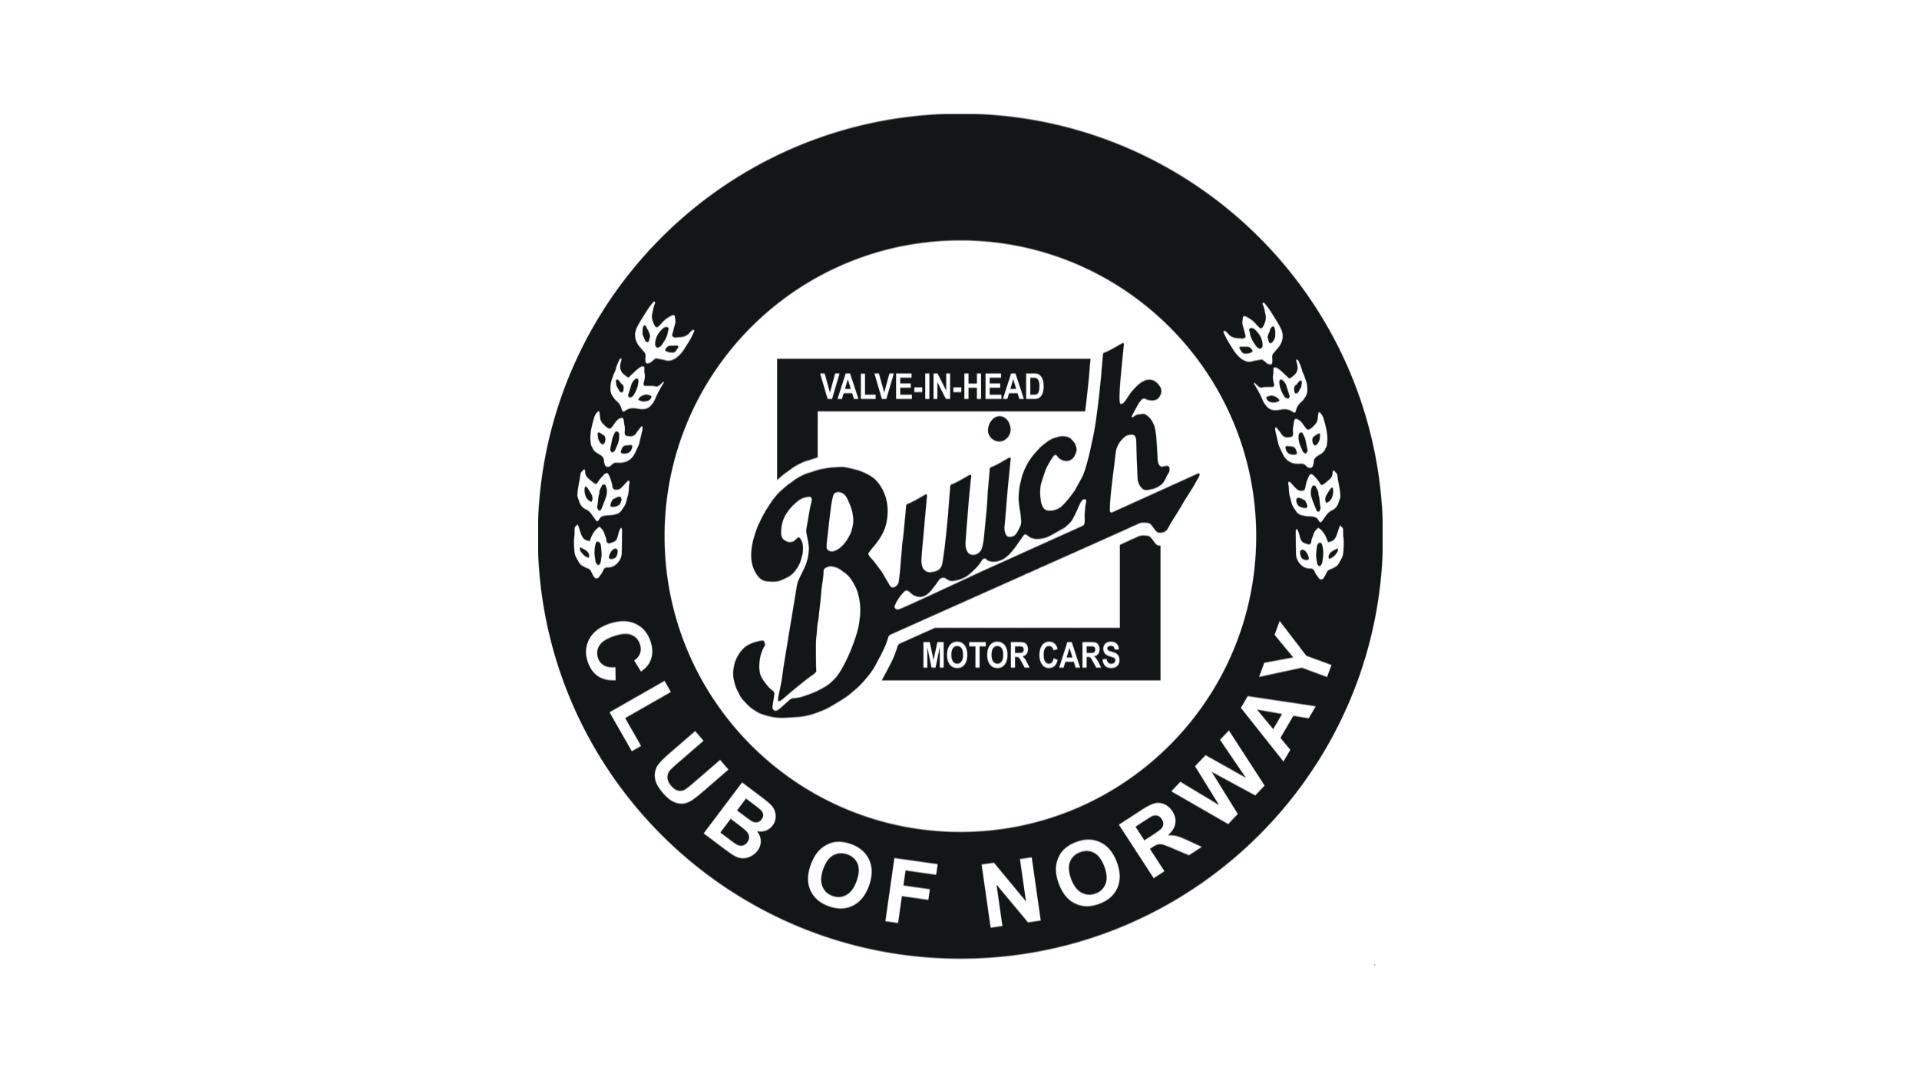 Buick+club+of+norway-Fullskjerm.jpg